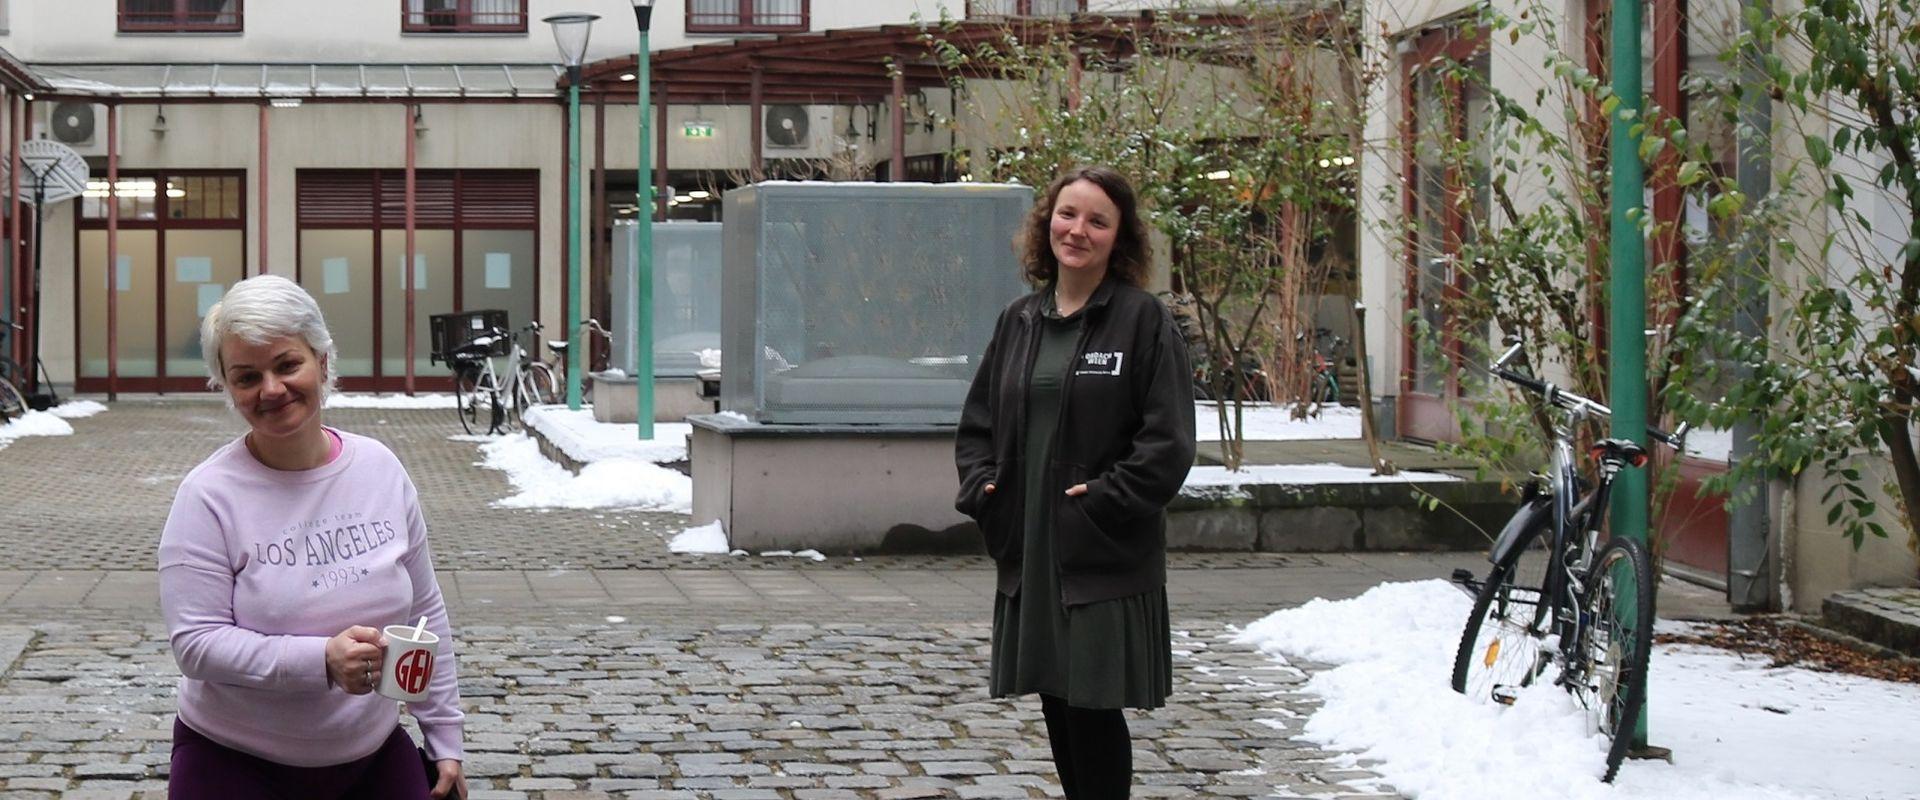 Frau Silvia S. und Betreuerin Anna im Hof des Obdach Favorita.